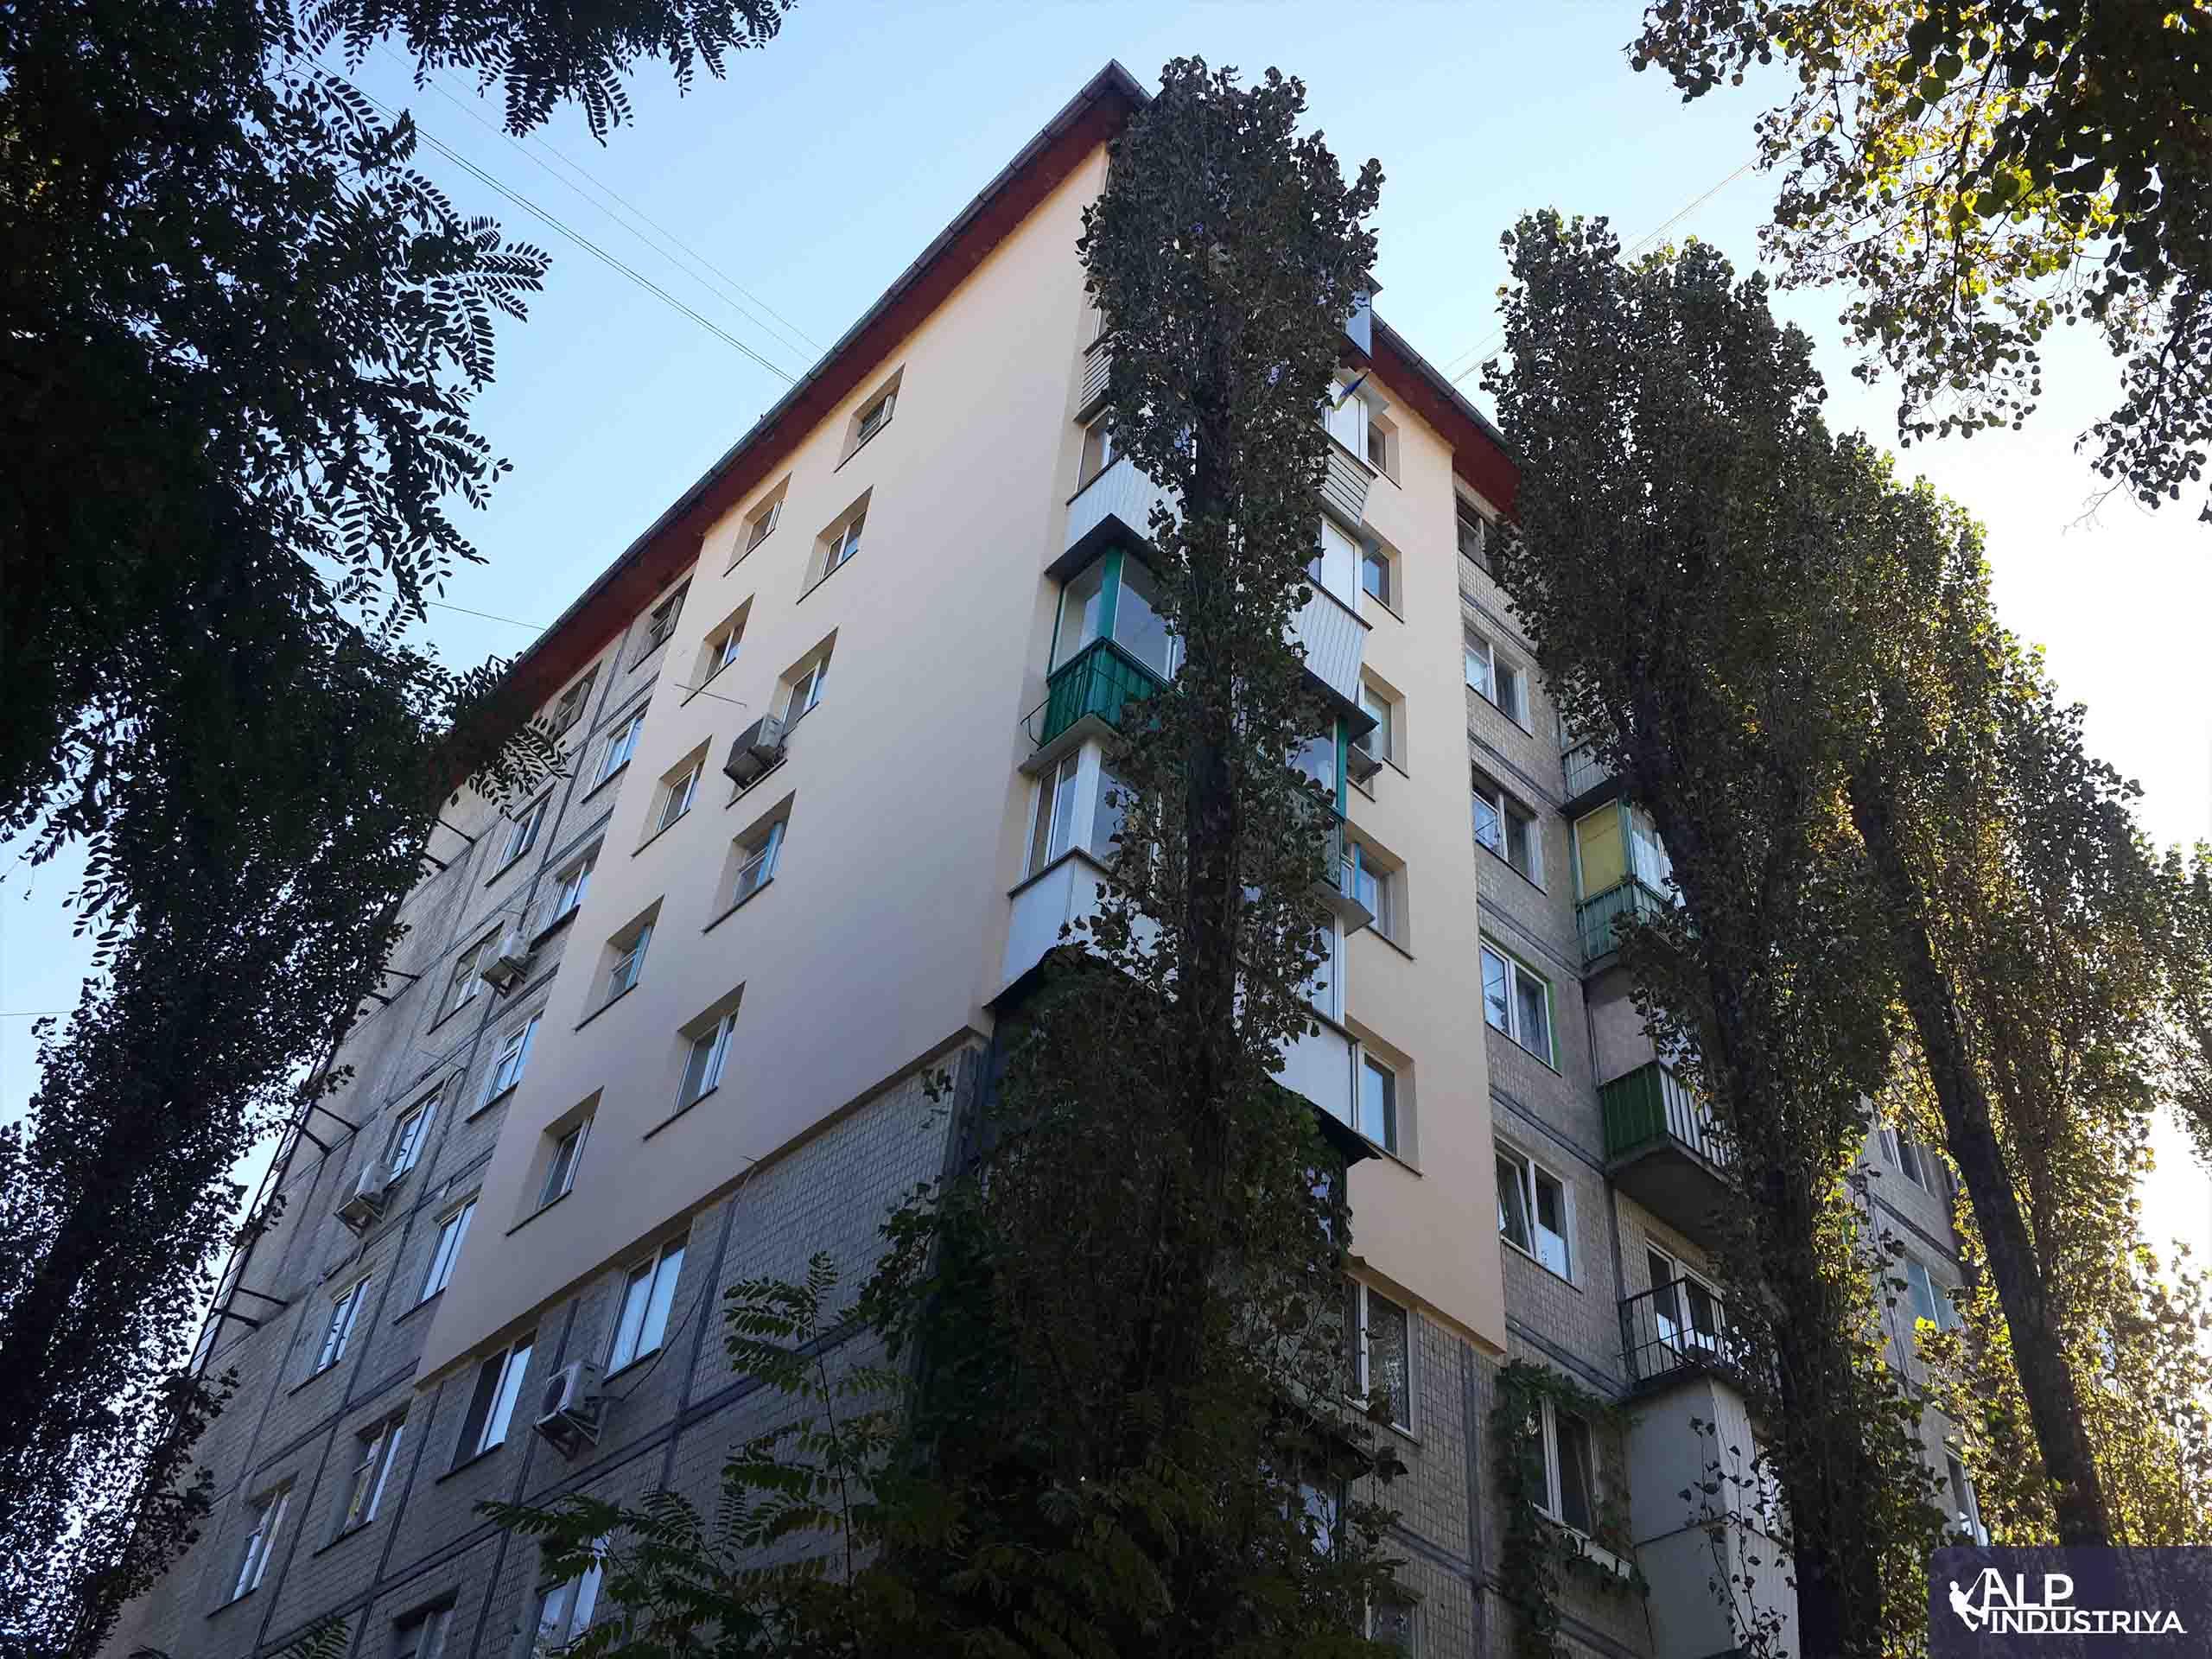 Теплоизоляция стен и углов многоквартирного дома промальпами-1